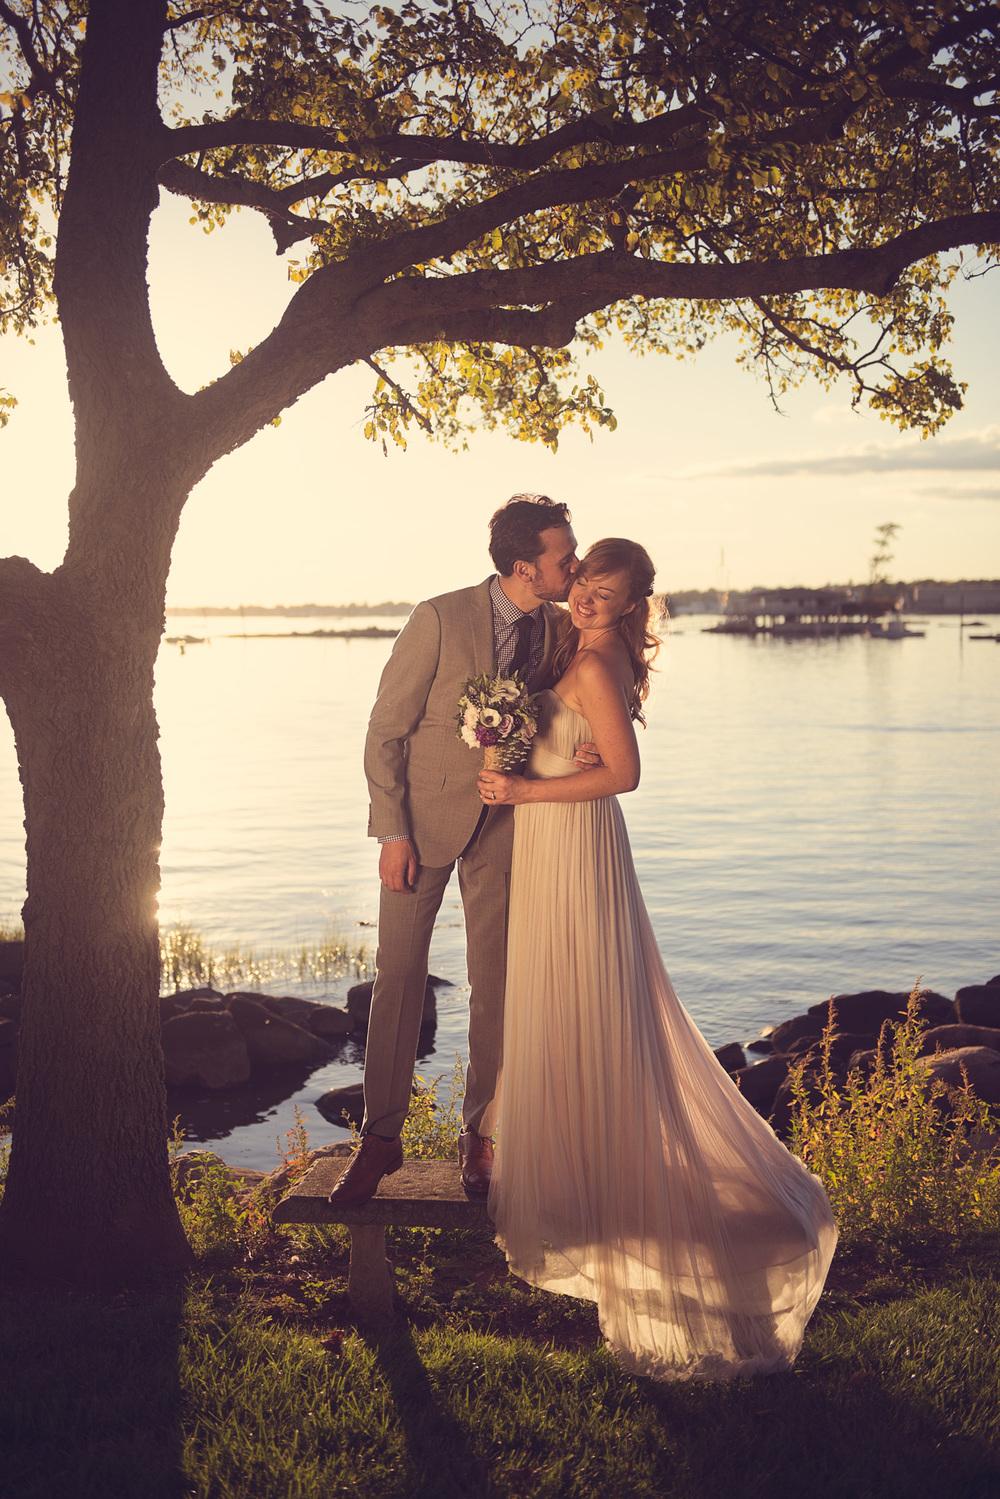 bride groom kiss sunset portrait bench tree beautiful husband wife coast ocean New England smooch romance